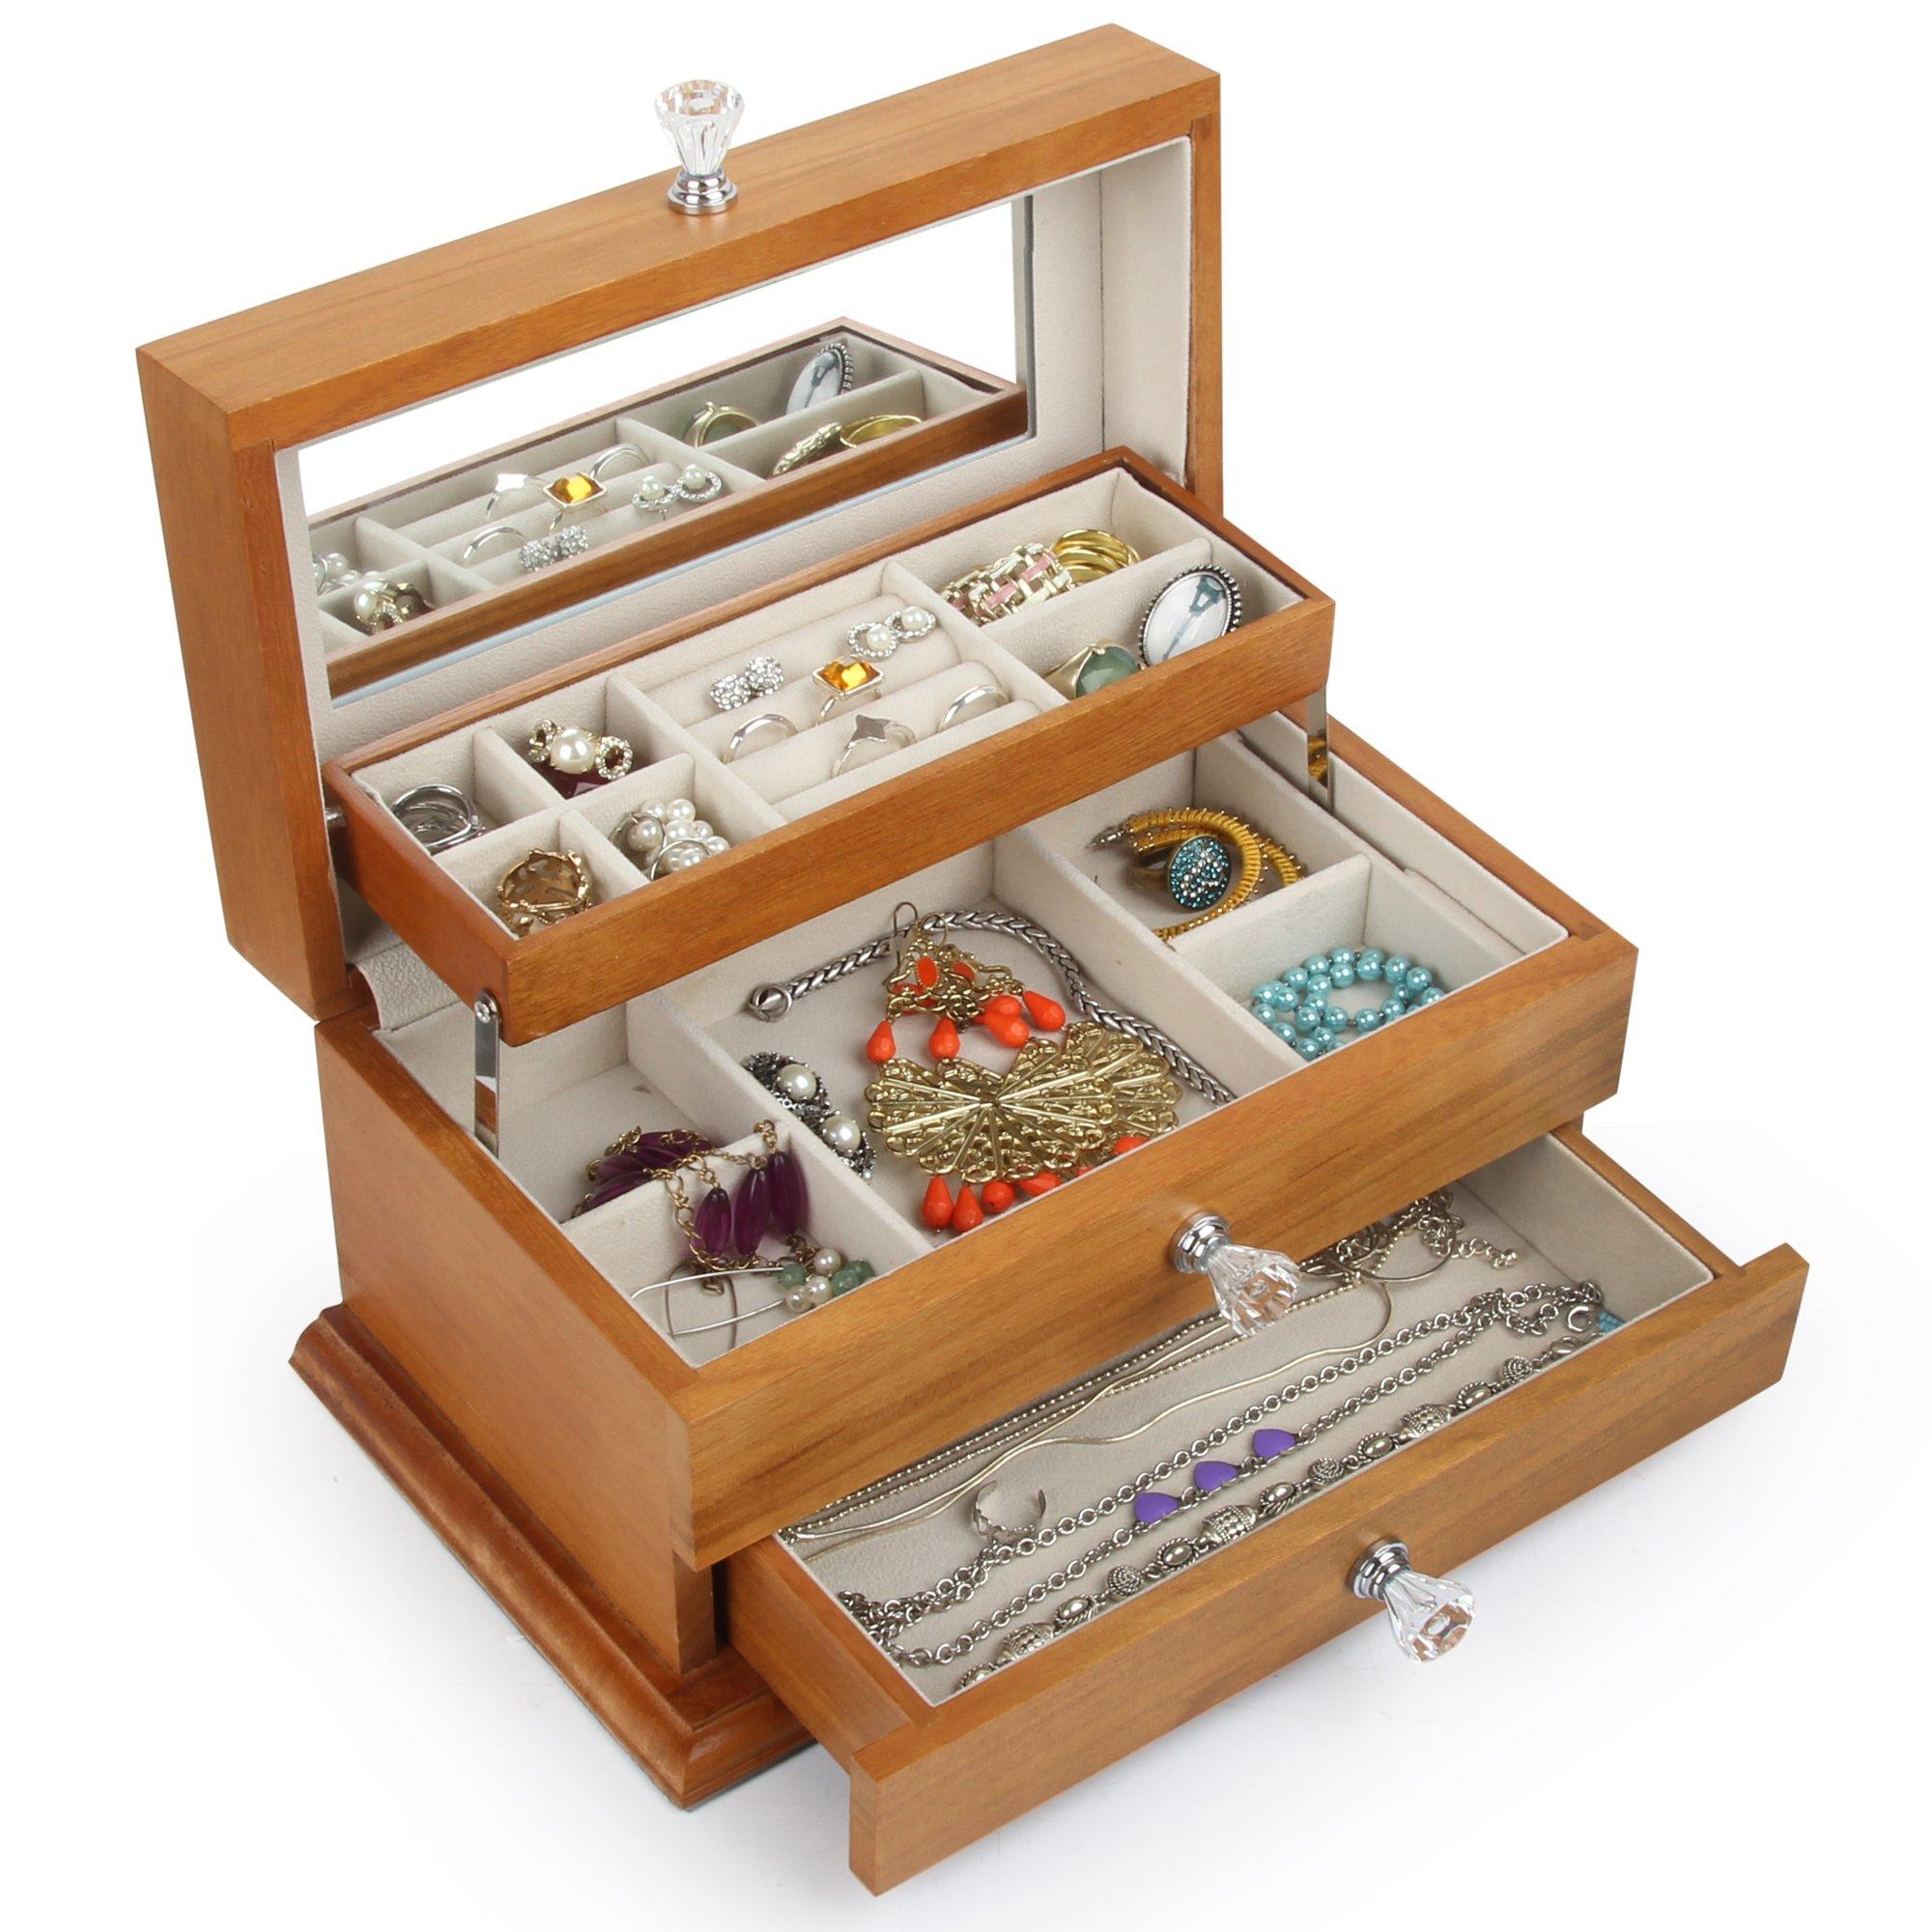 Real Natural Hardwood Wooden Jewelry Box (2-ZH-WJC3AK)